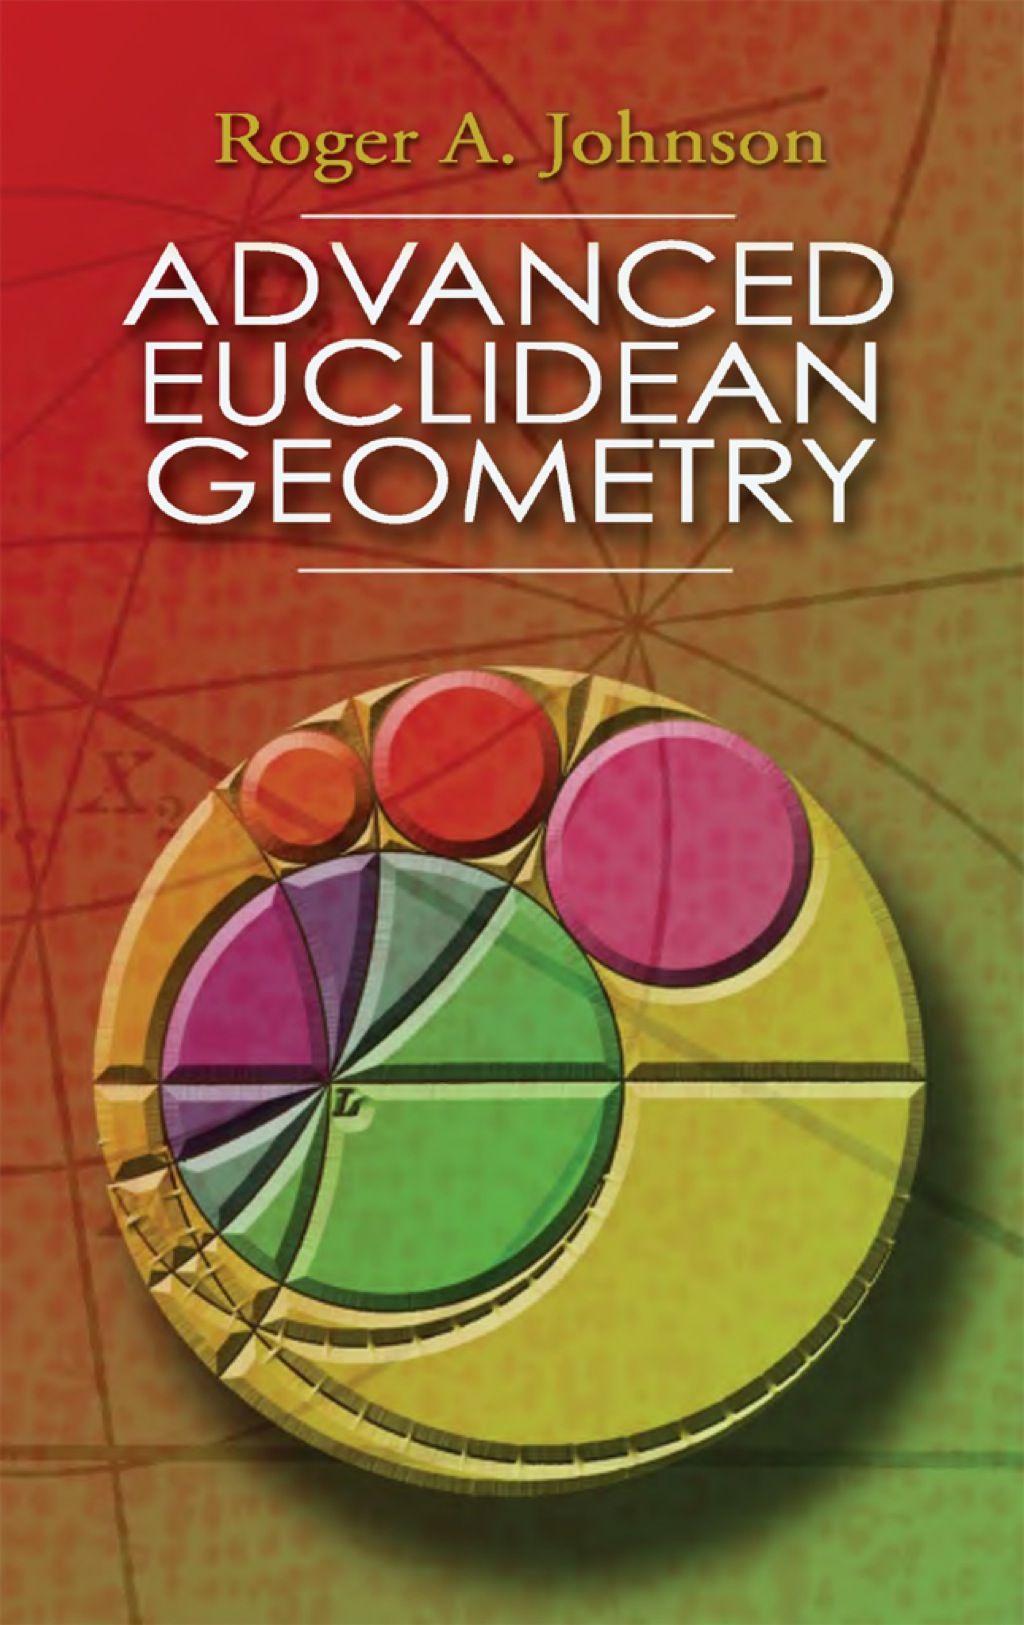 Advanced Euclidean Geometry Ebook Euclidean Geometry Advanced